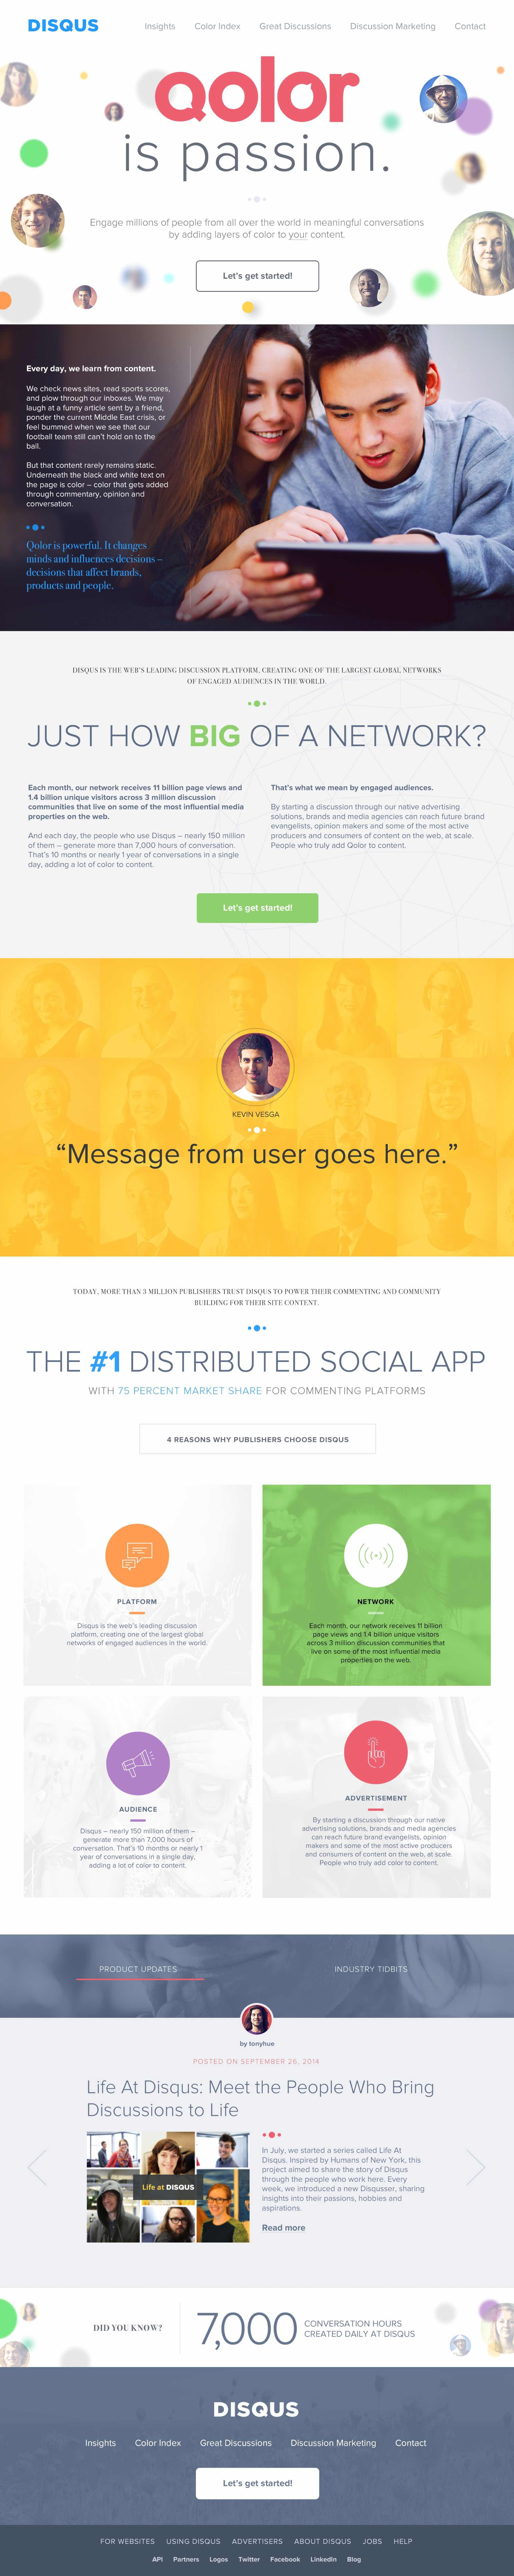 Disqus for Business website concept